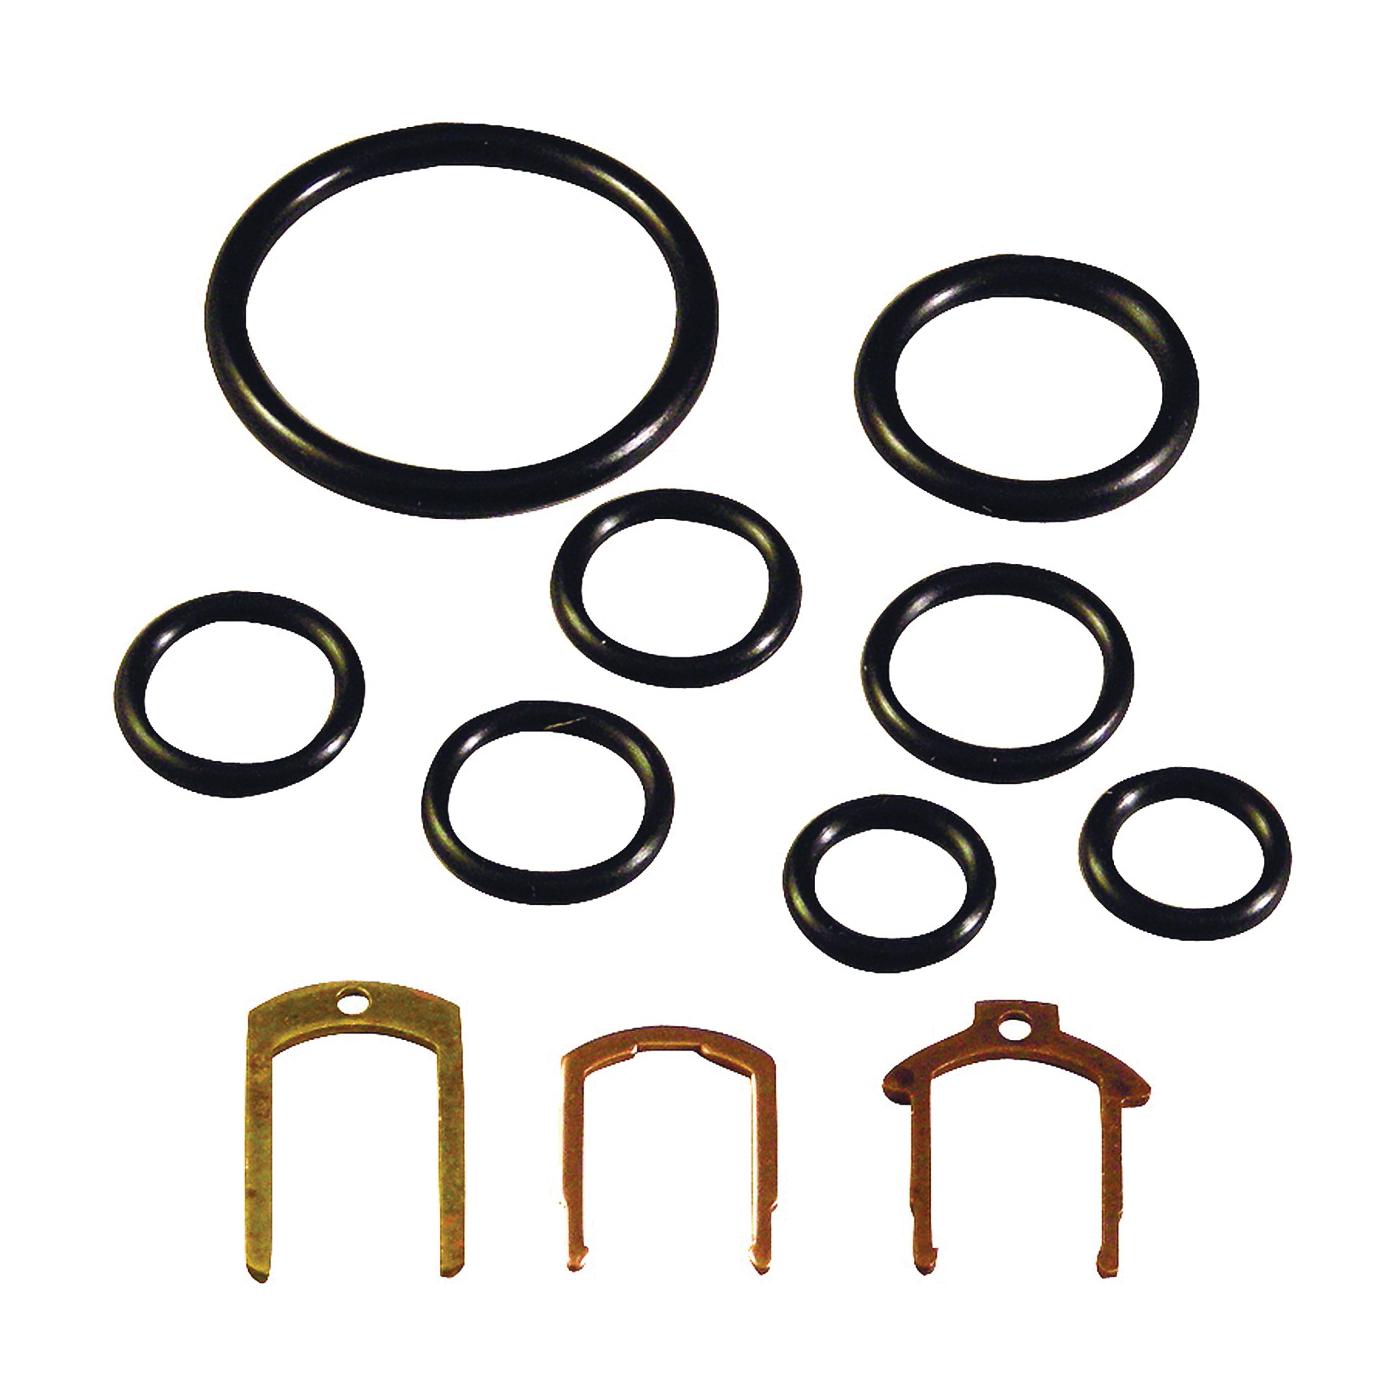 Picture of Danco 86647 Cartridge Repair Kit, Copper, 11-Piece, For: Moen Faucets